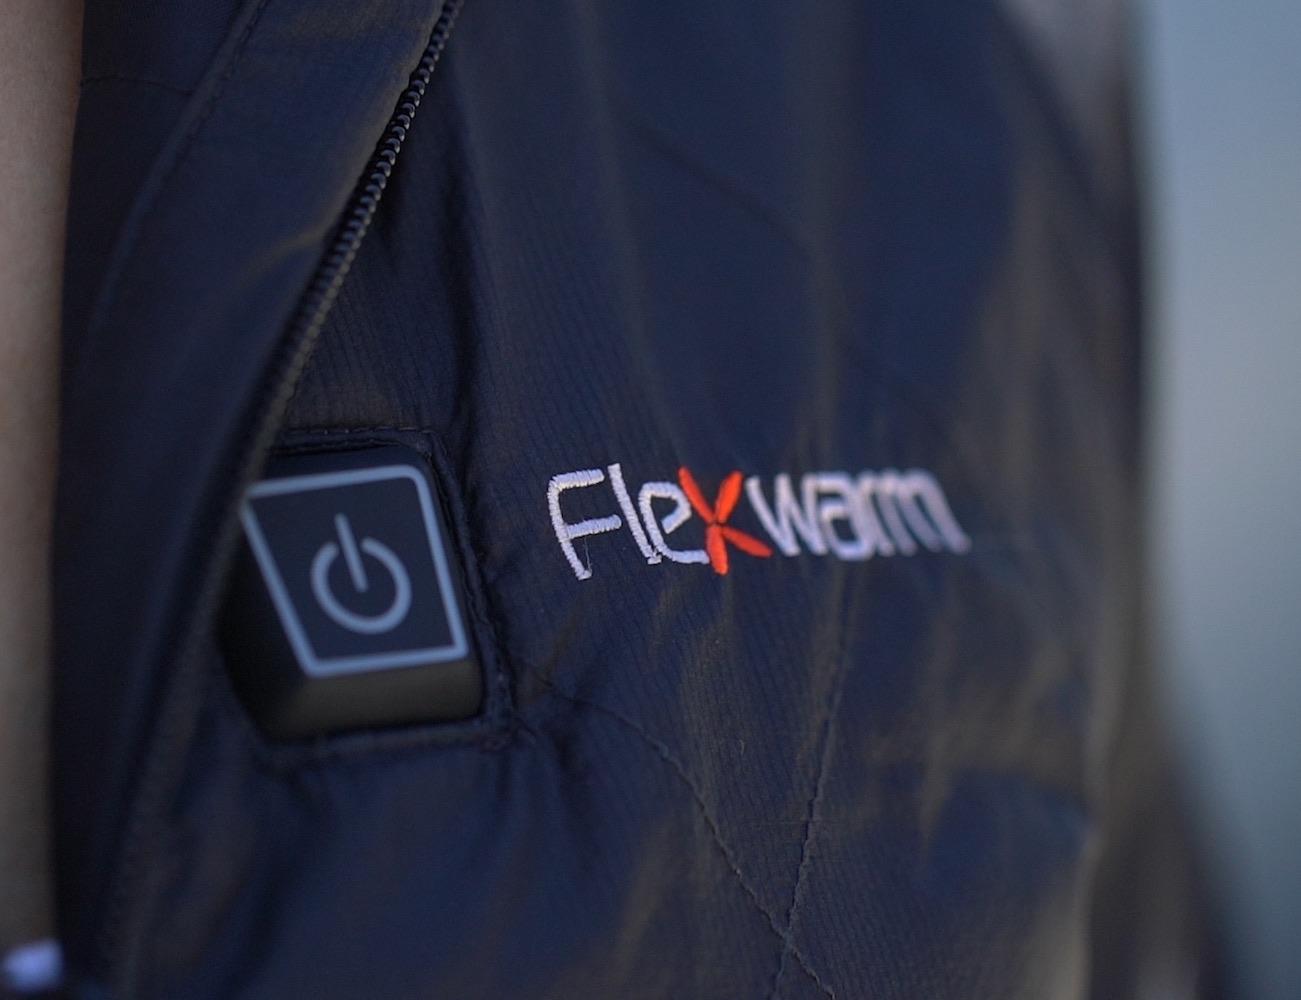 Flexwarm – World's Smartest Jacket